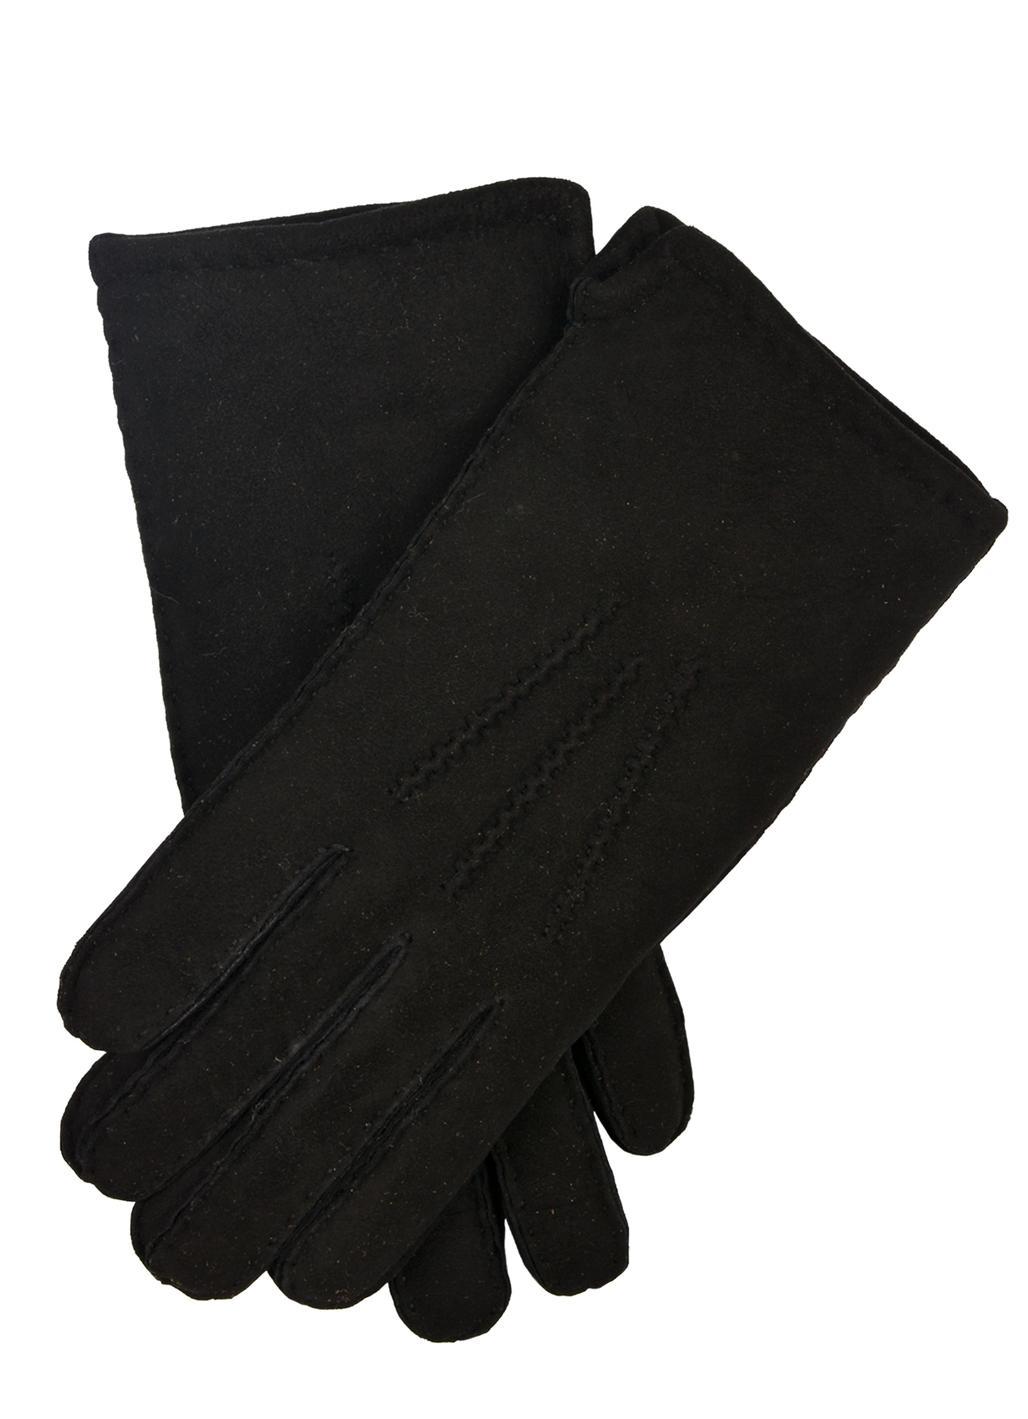 Elsa Sheepskin Gloves in Black